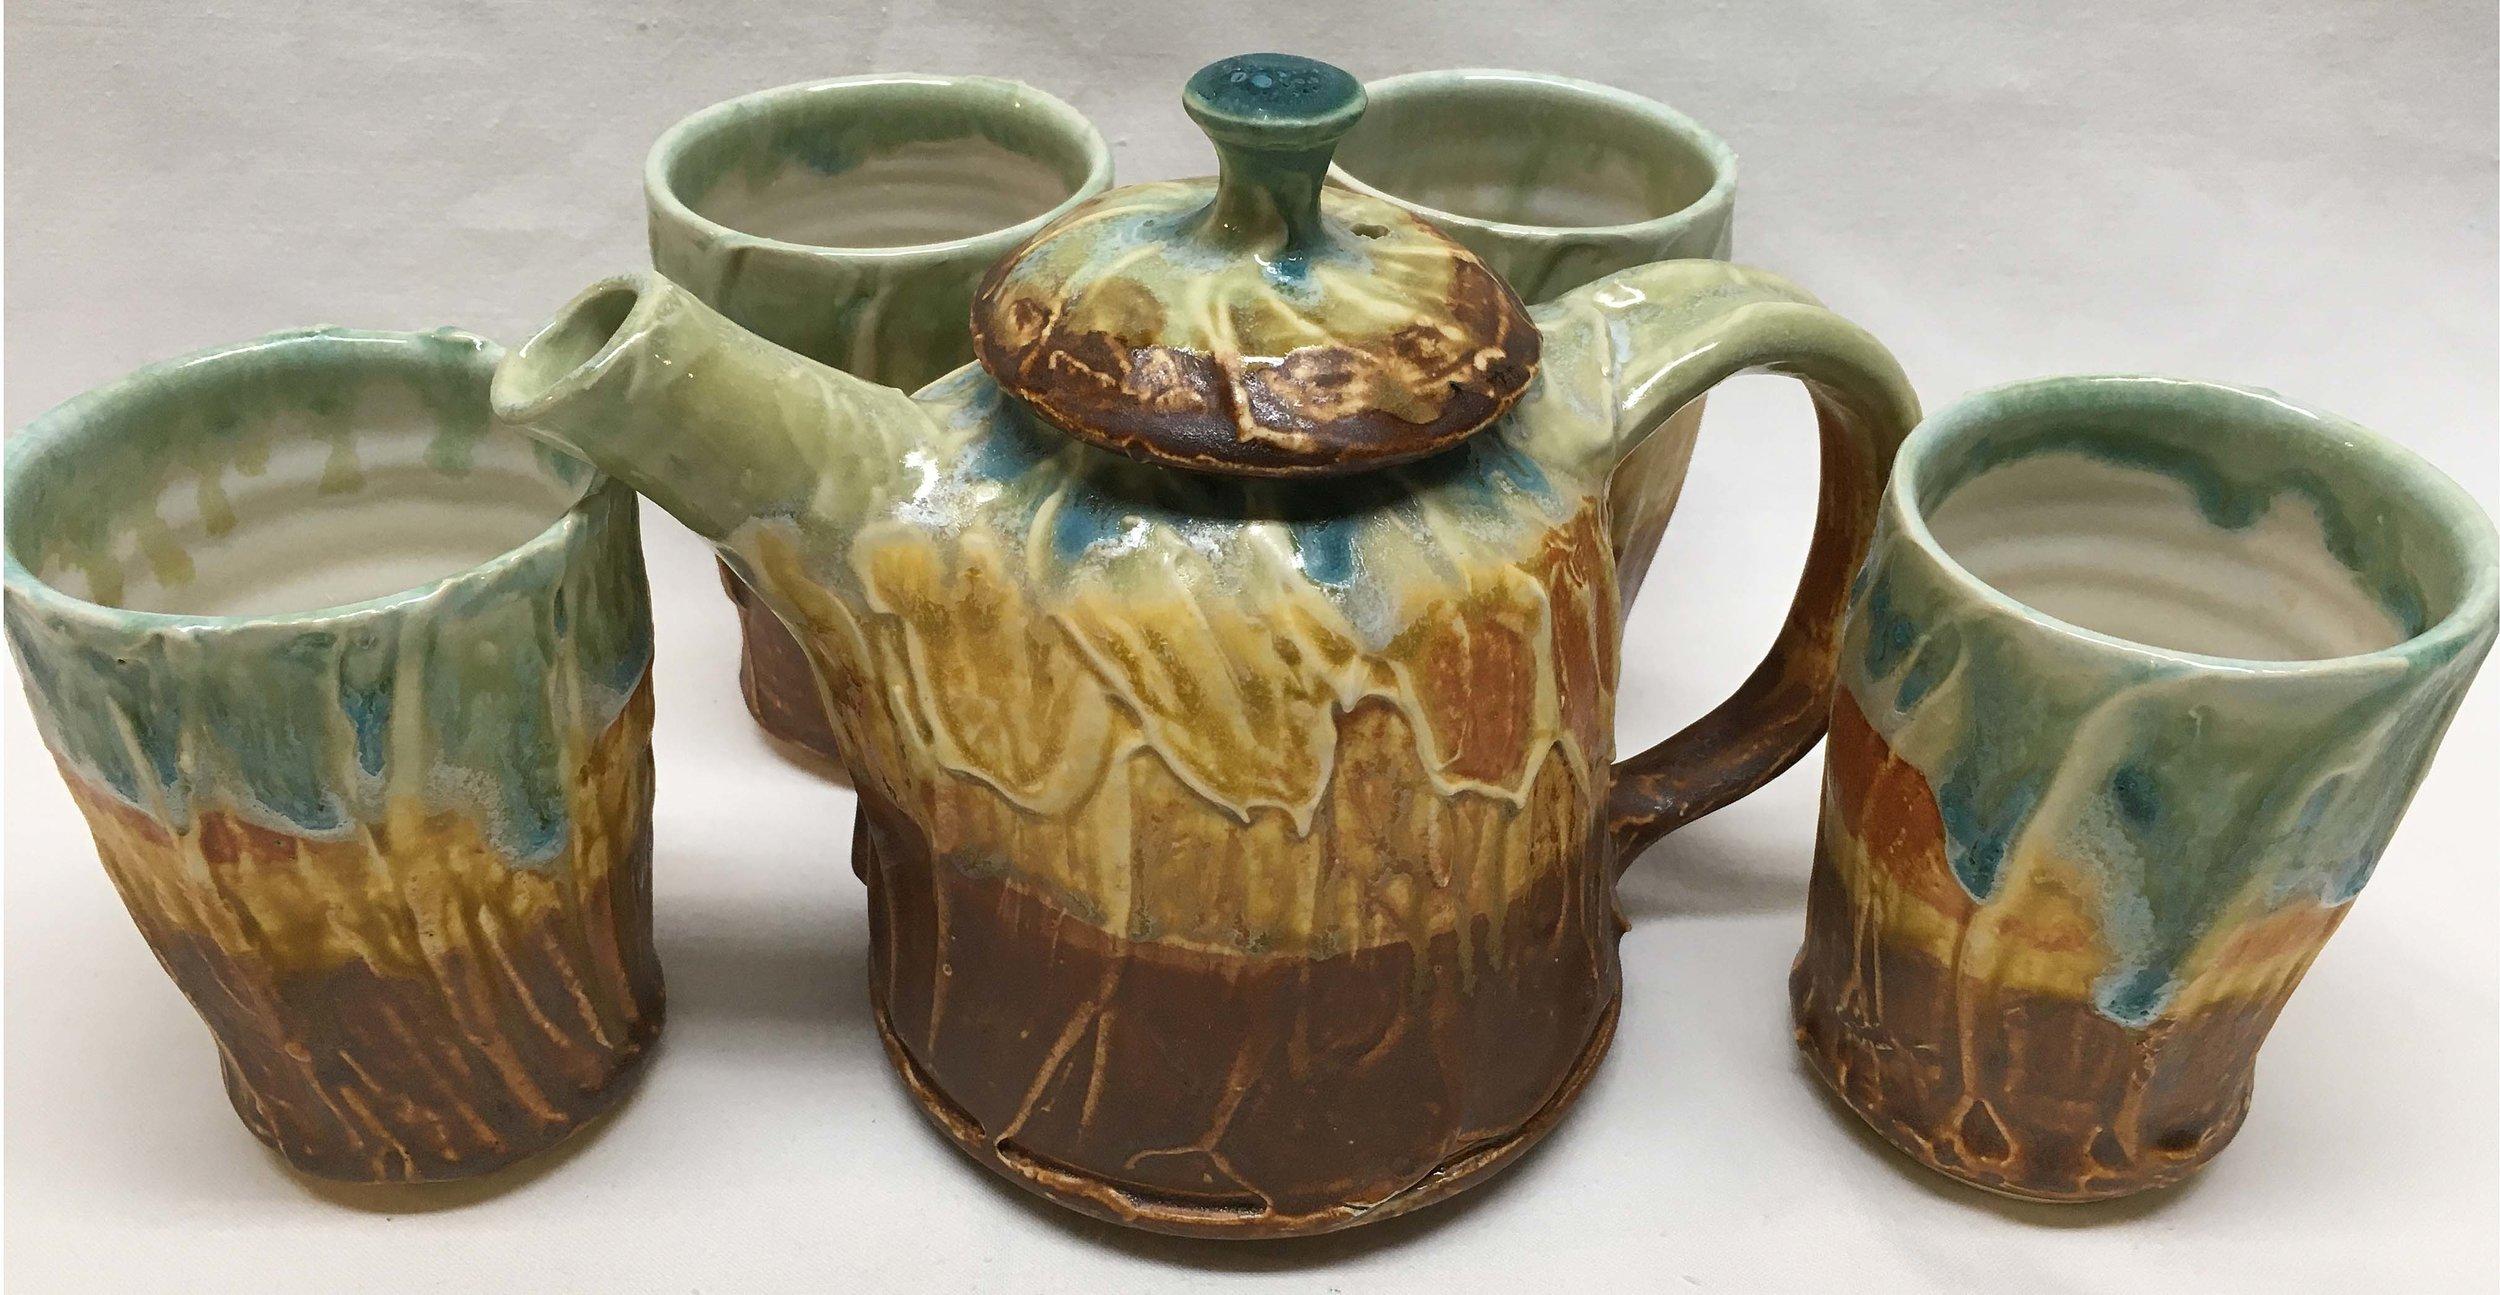 Textured Teapot & 4 Cups - Deborah Wheeler